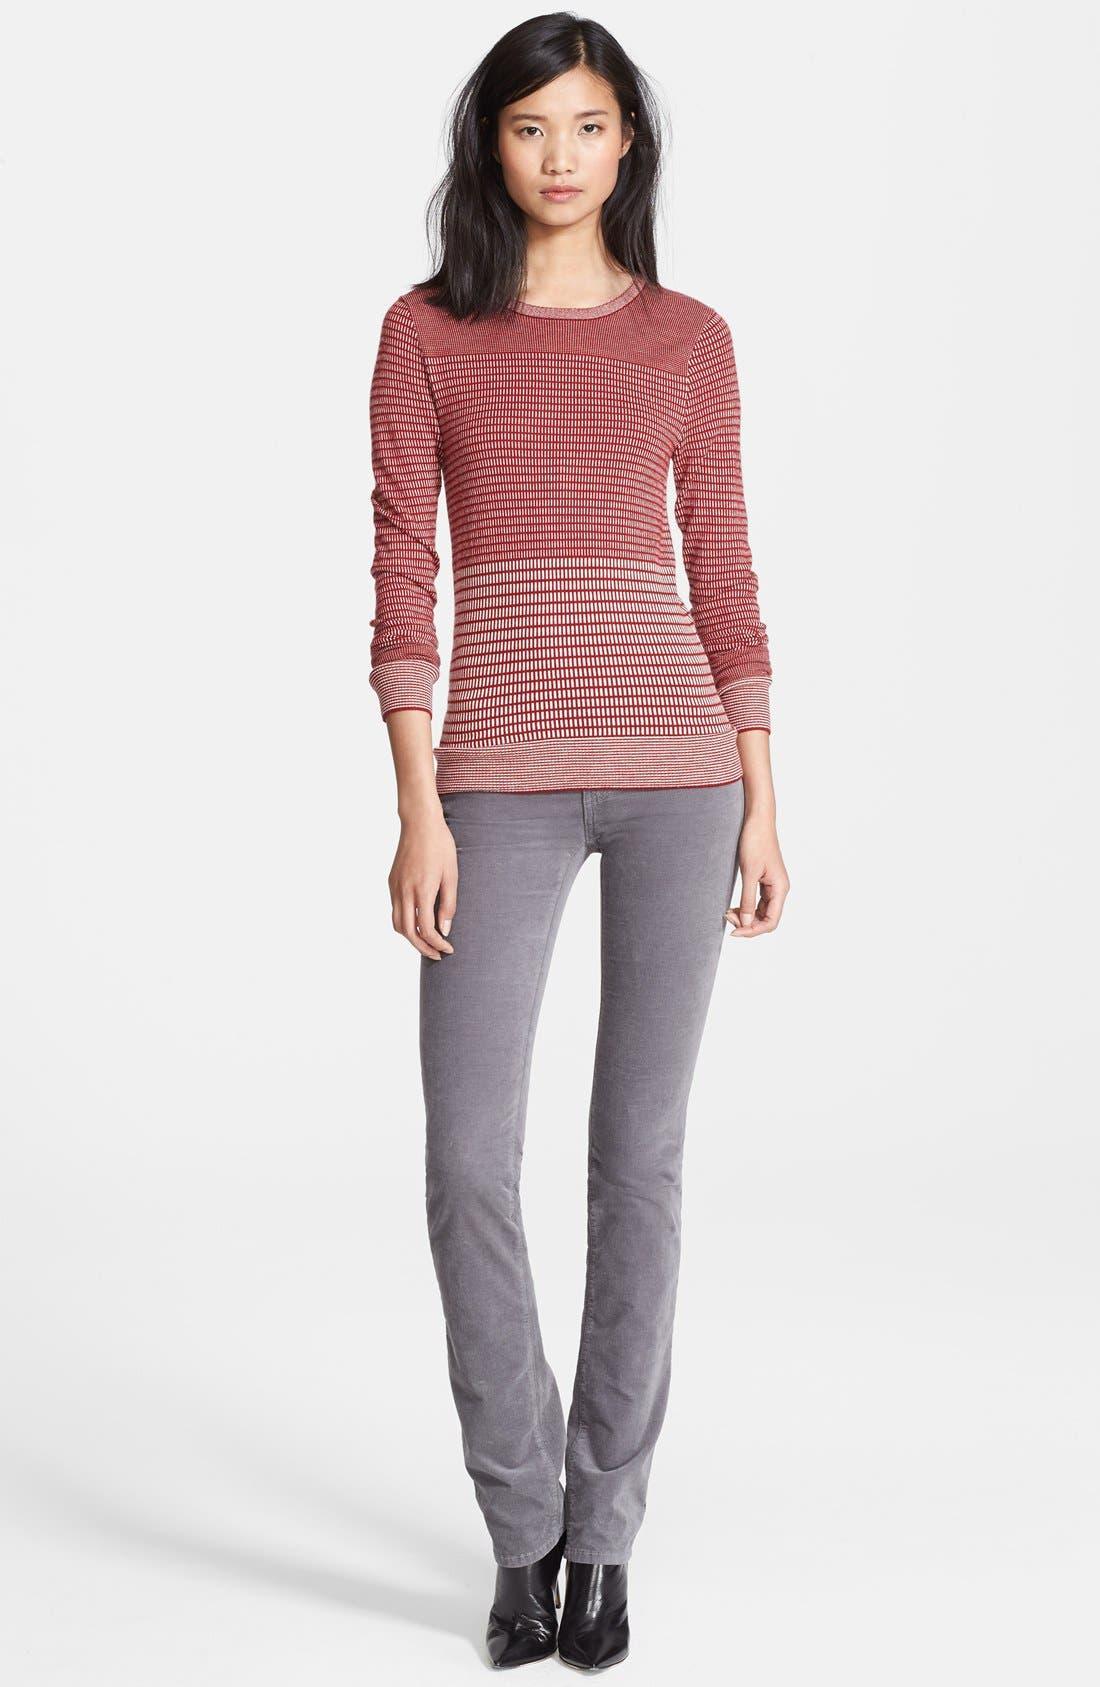 Main Image - Charlotte Gainsbourg for Current/Elliott Jacquard Sweater